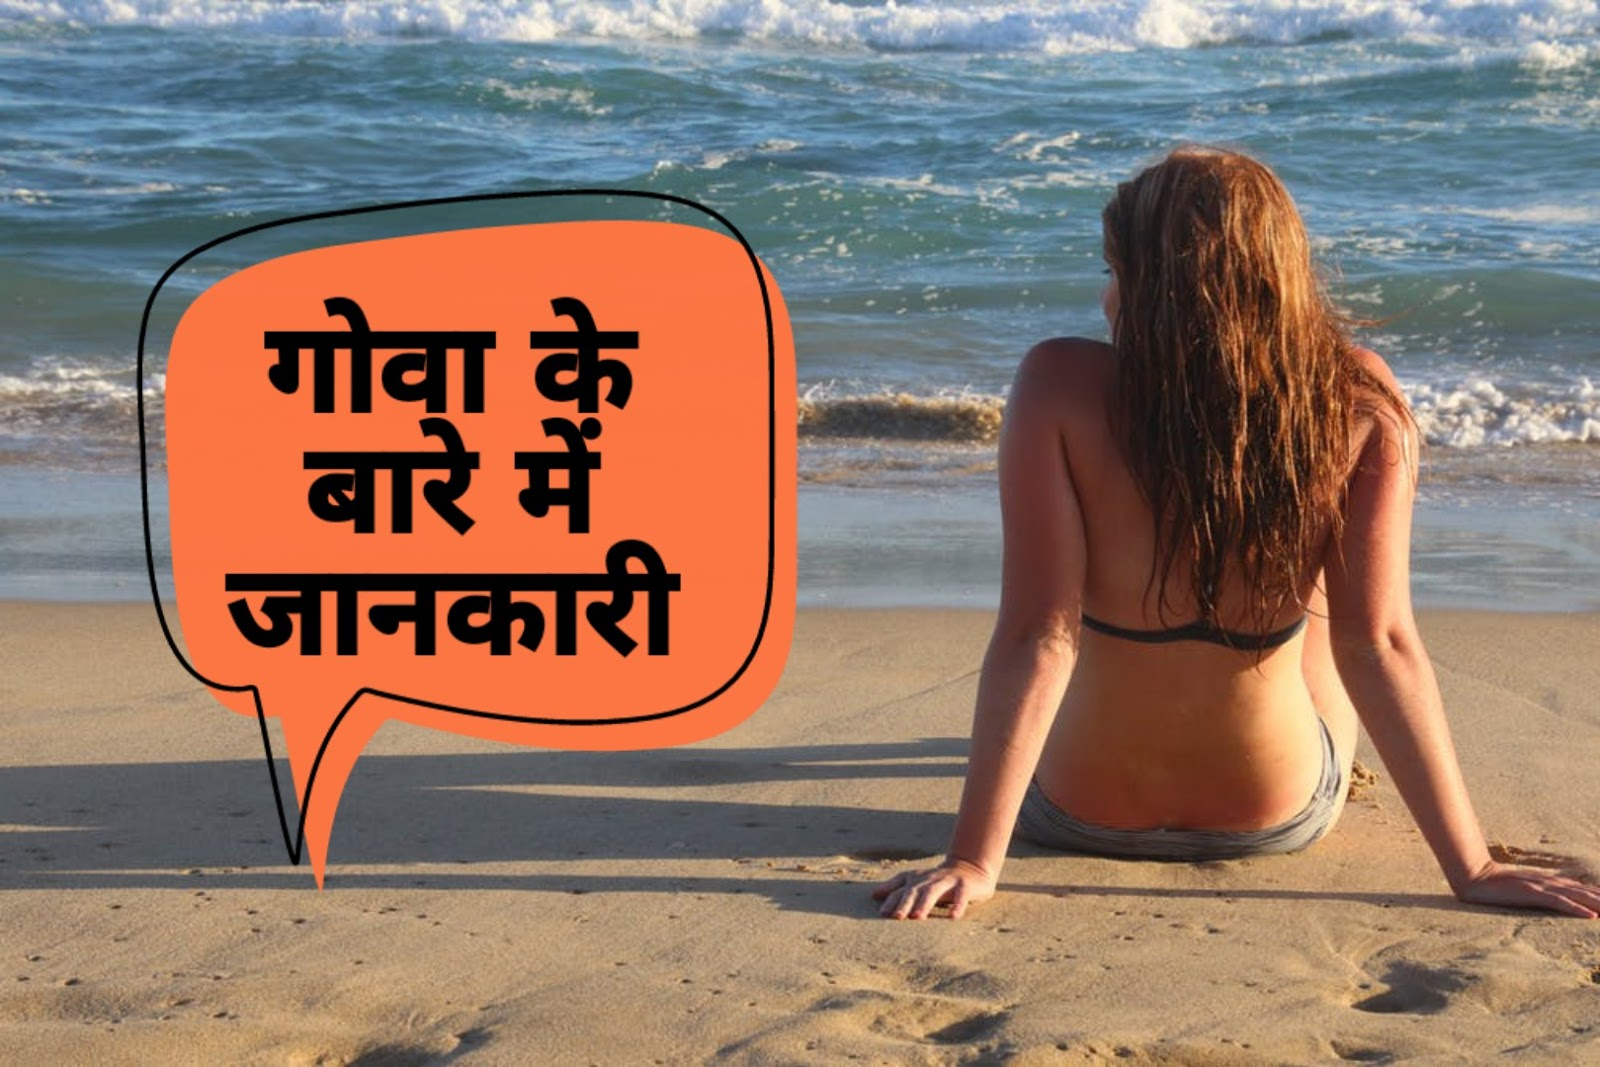 Amazing Facts about Goa in Hindi - गोवा के बारे में रोचक तथ्य